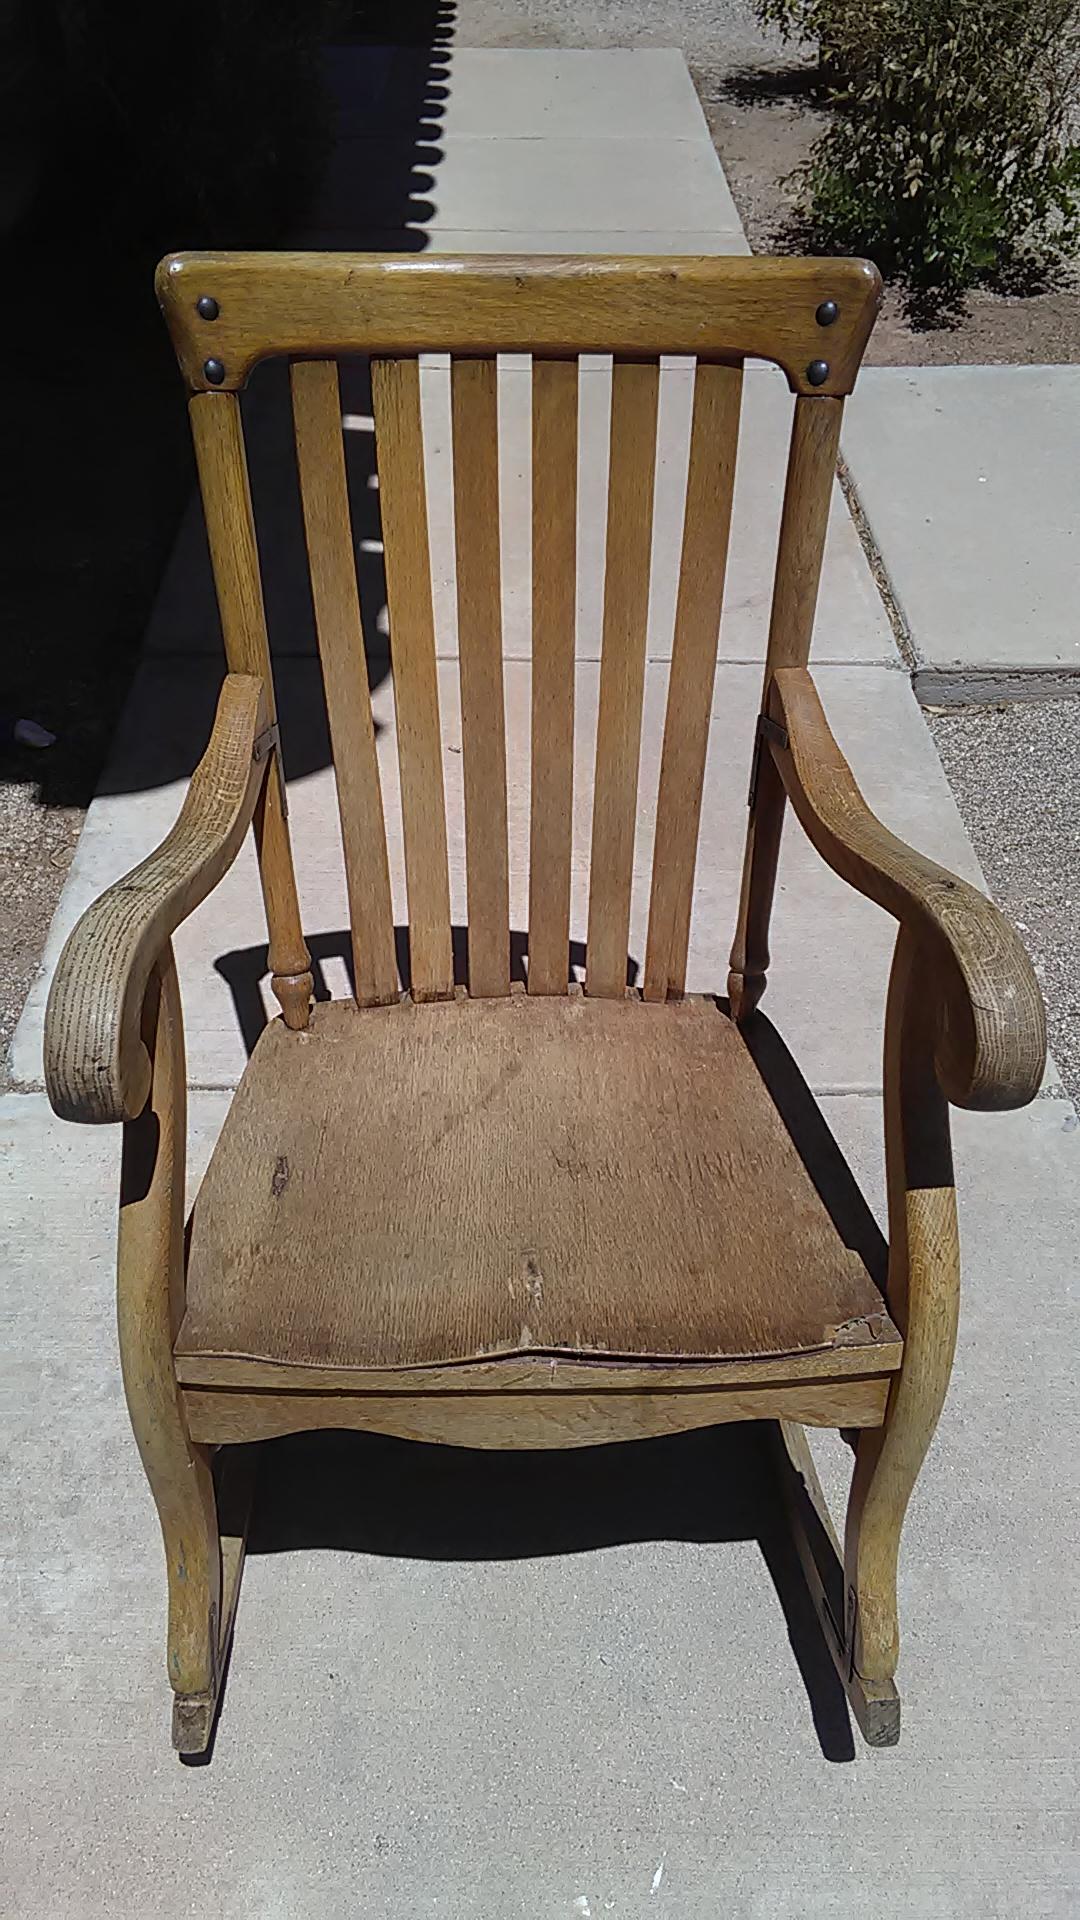 Murphy chair pany rocking chair antique appraisal